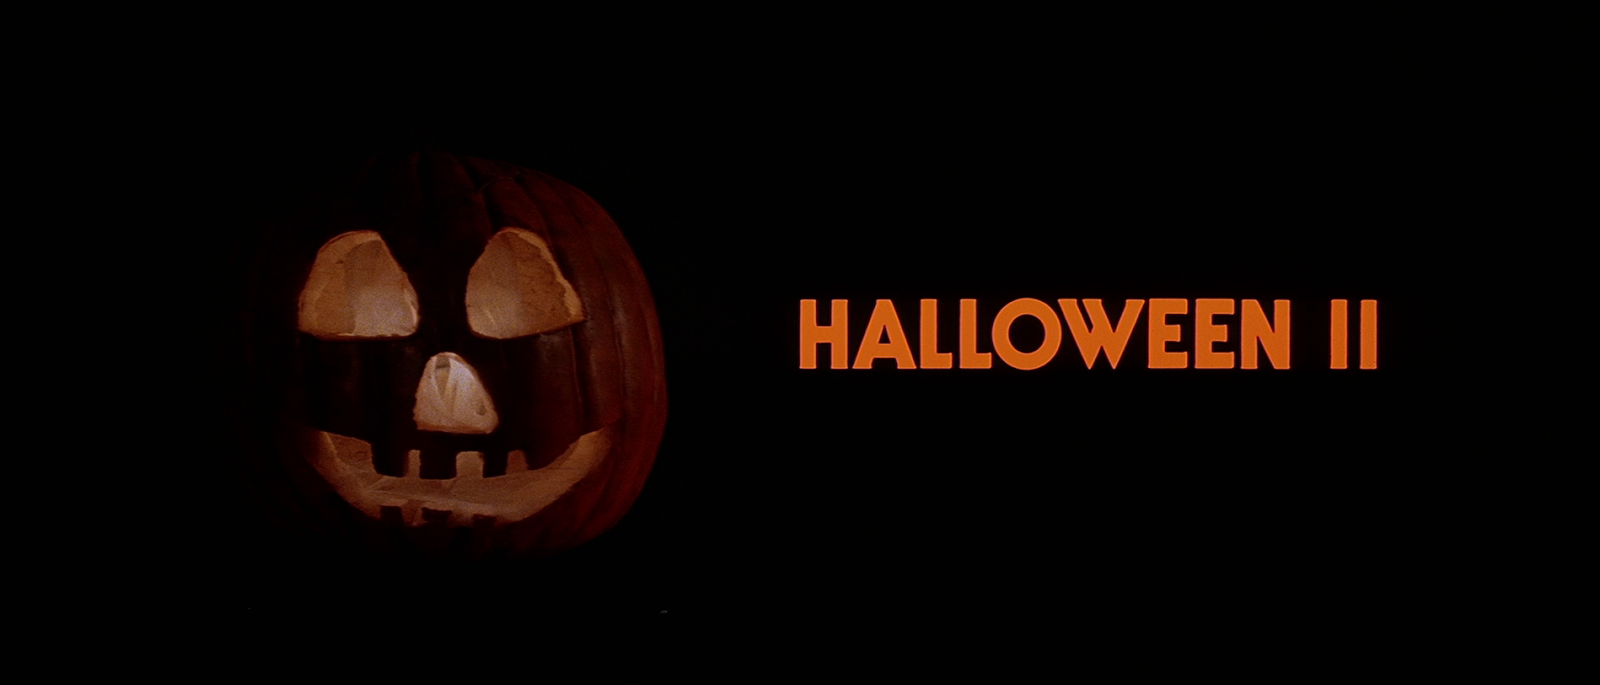 halloween 2 movie wallpaper - photo #3